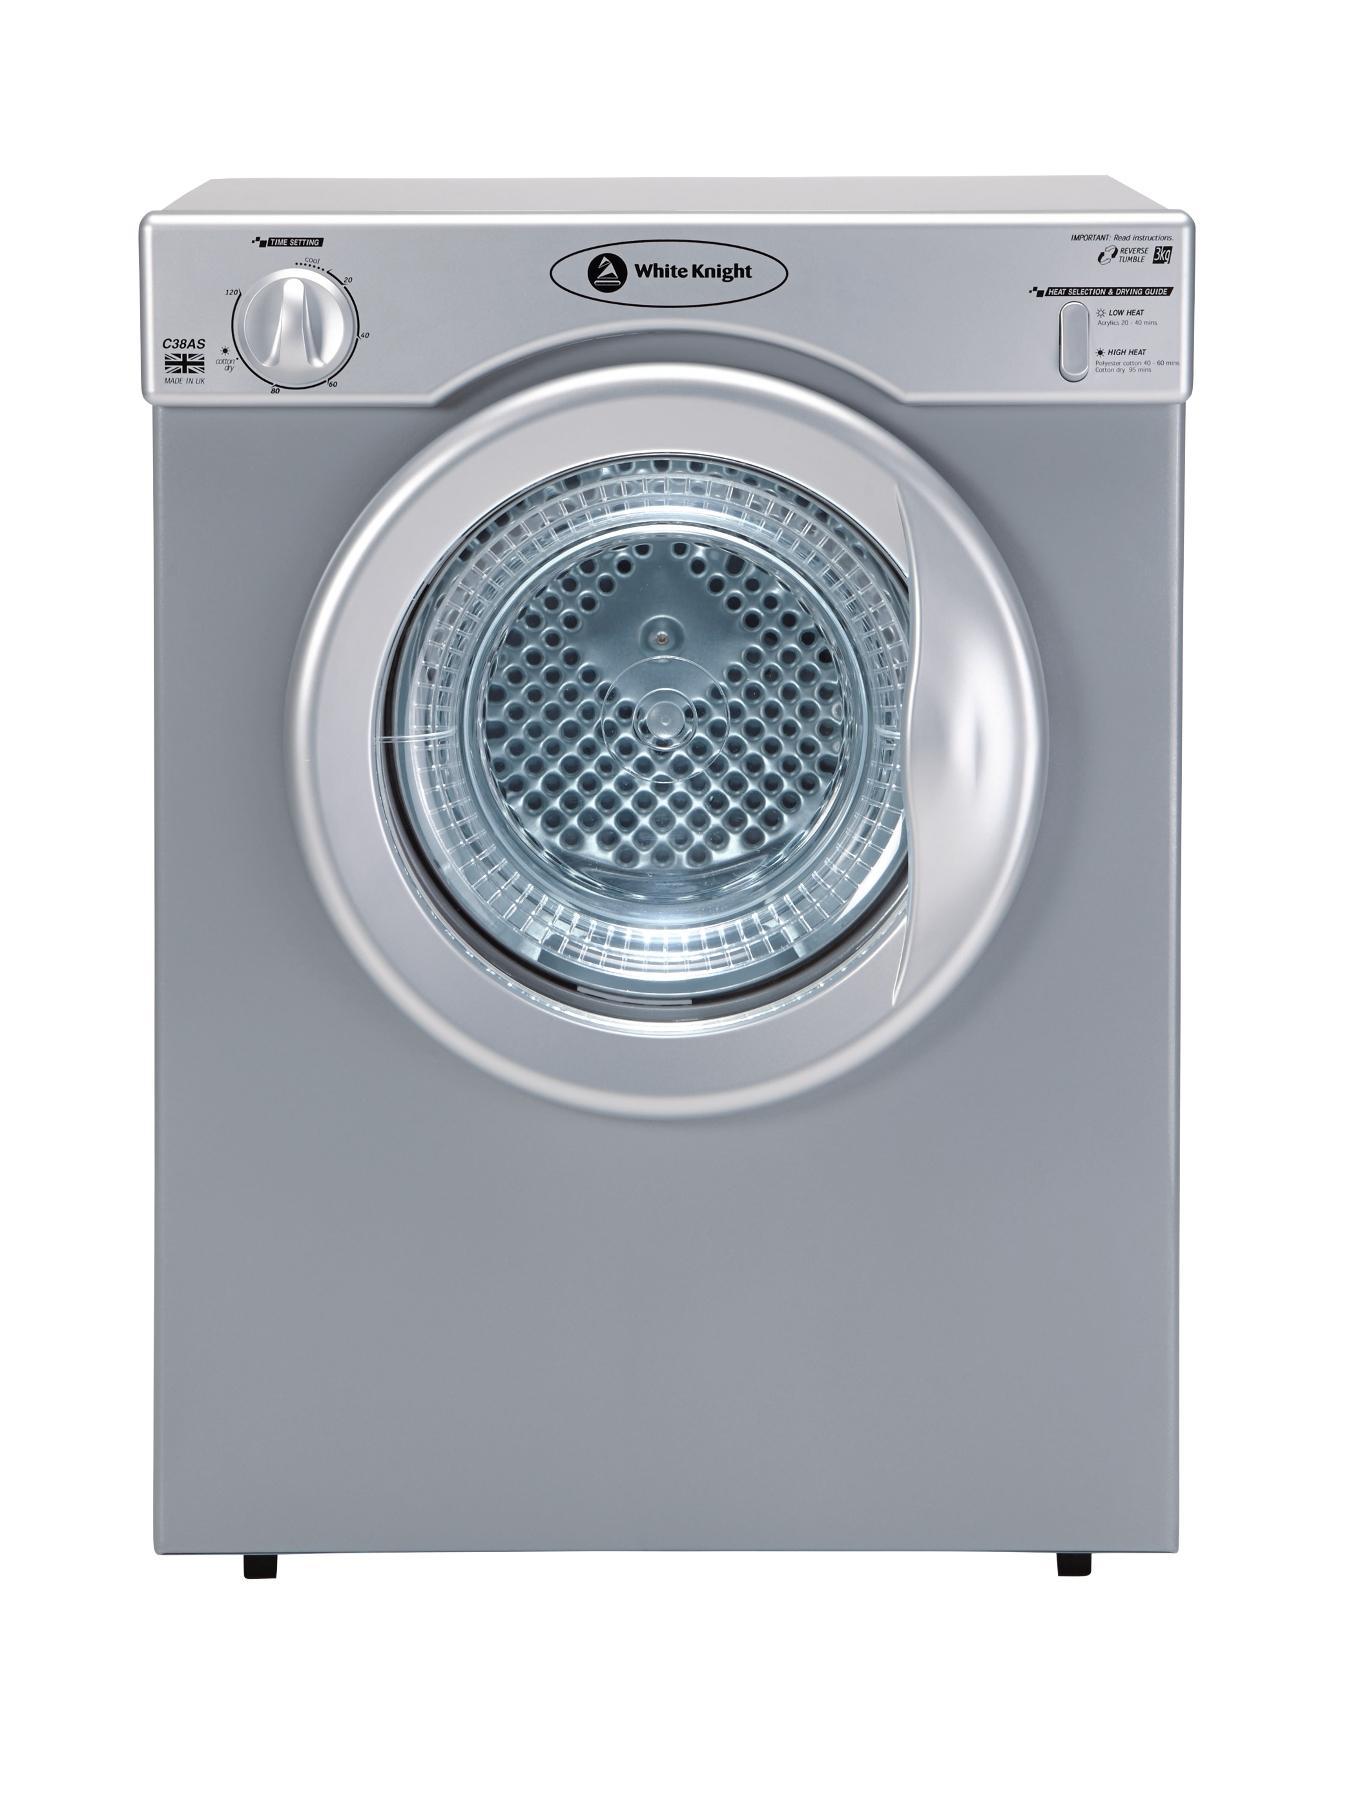 Tumble Dryer Uk ~ Tumble dryers small uk